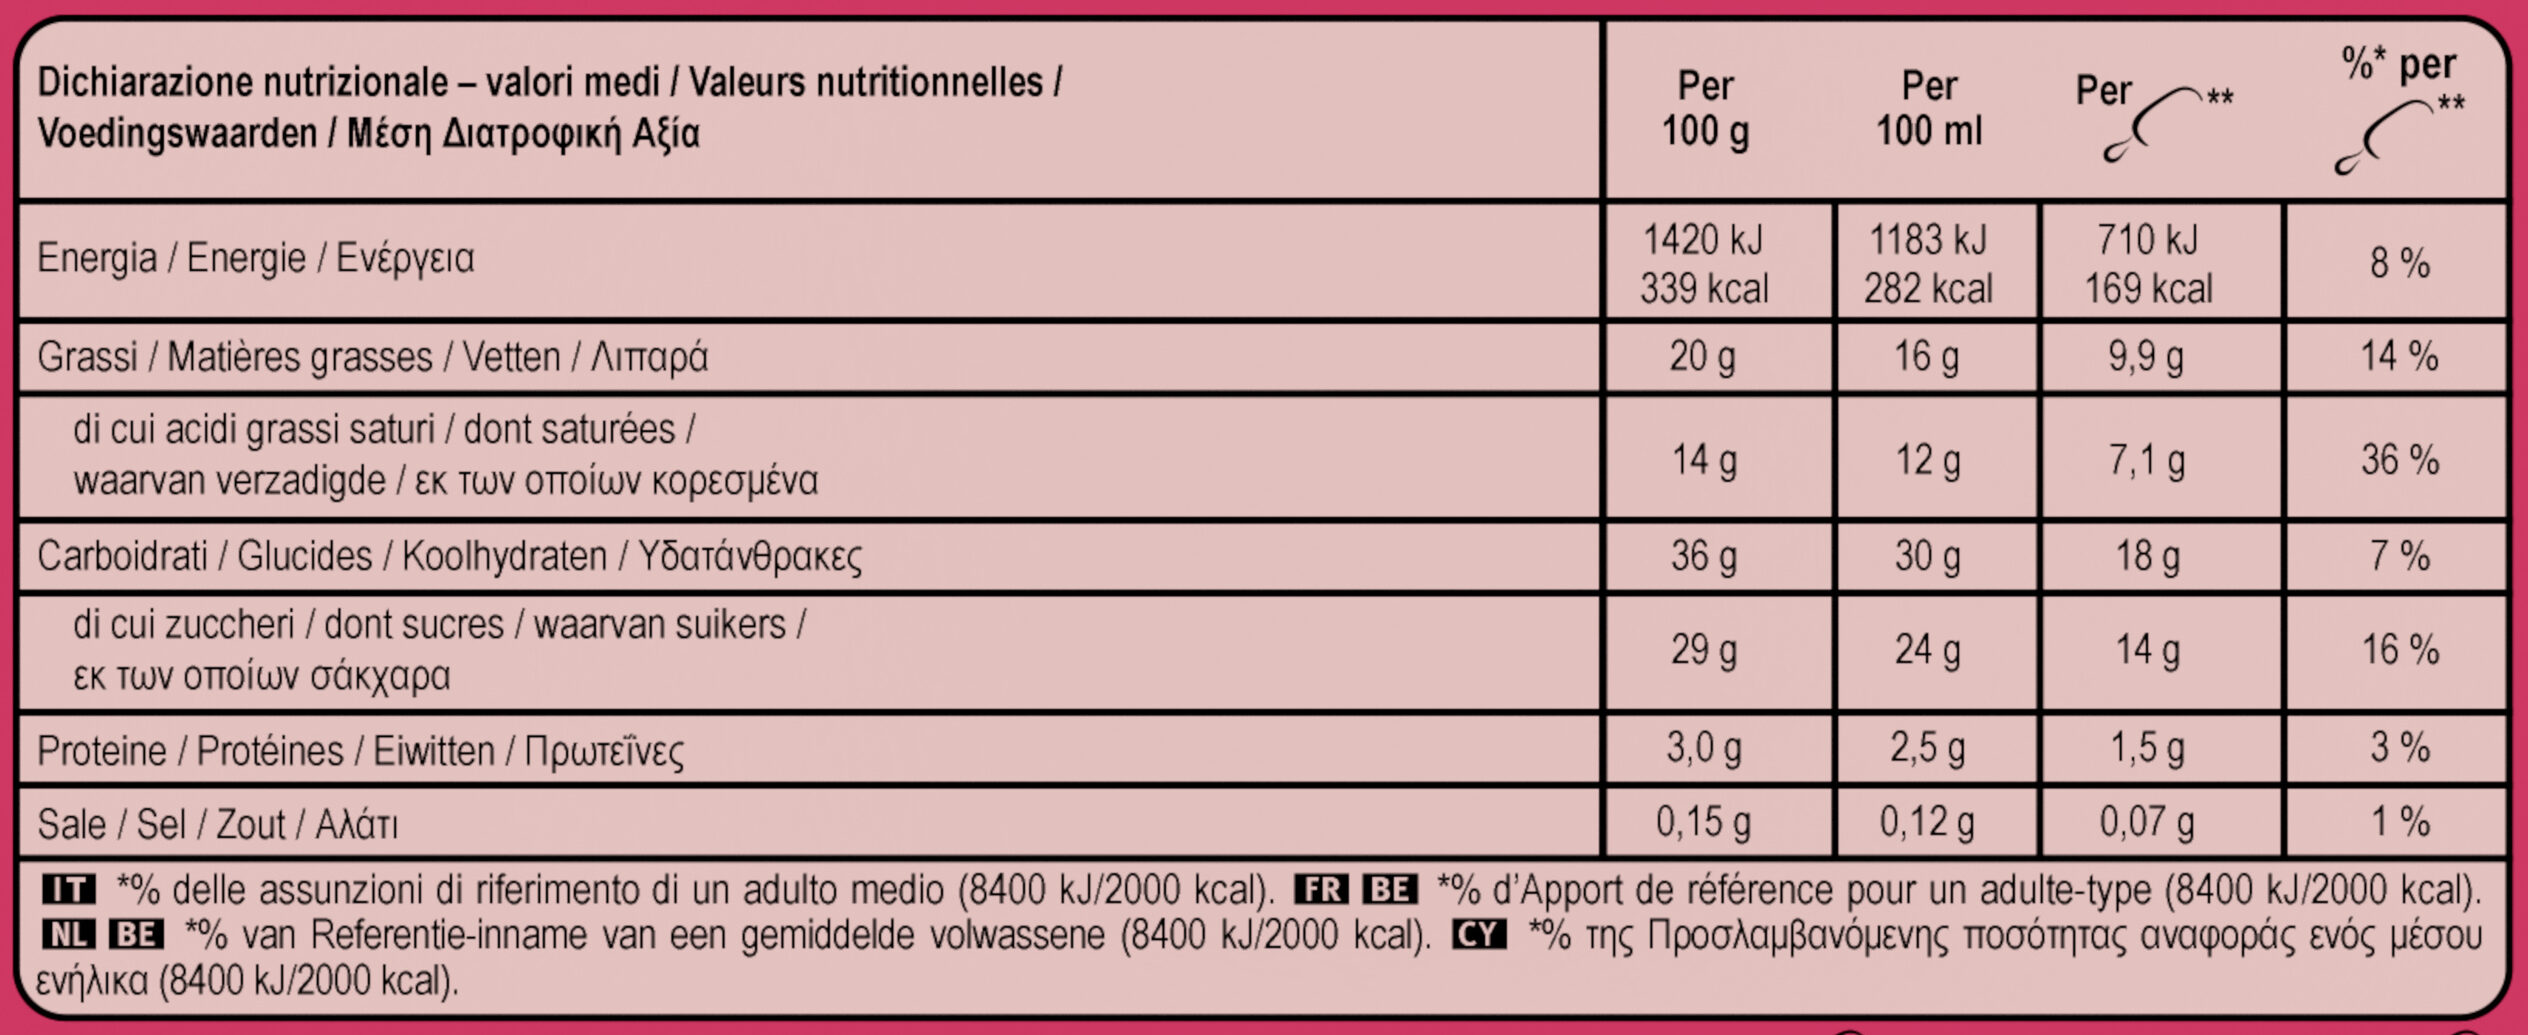 Magnum Glace Batonnet Mini Double Framboise 6x60ml - Informação nutricional - fr